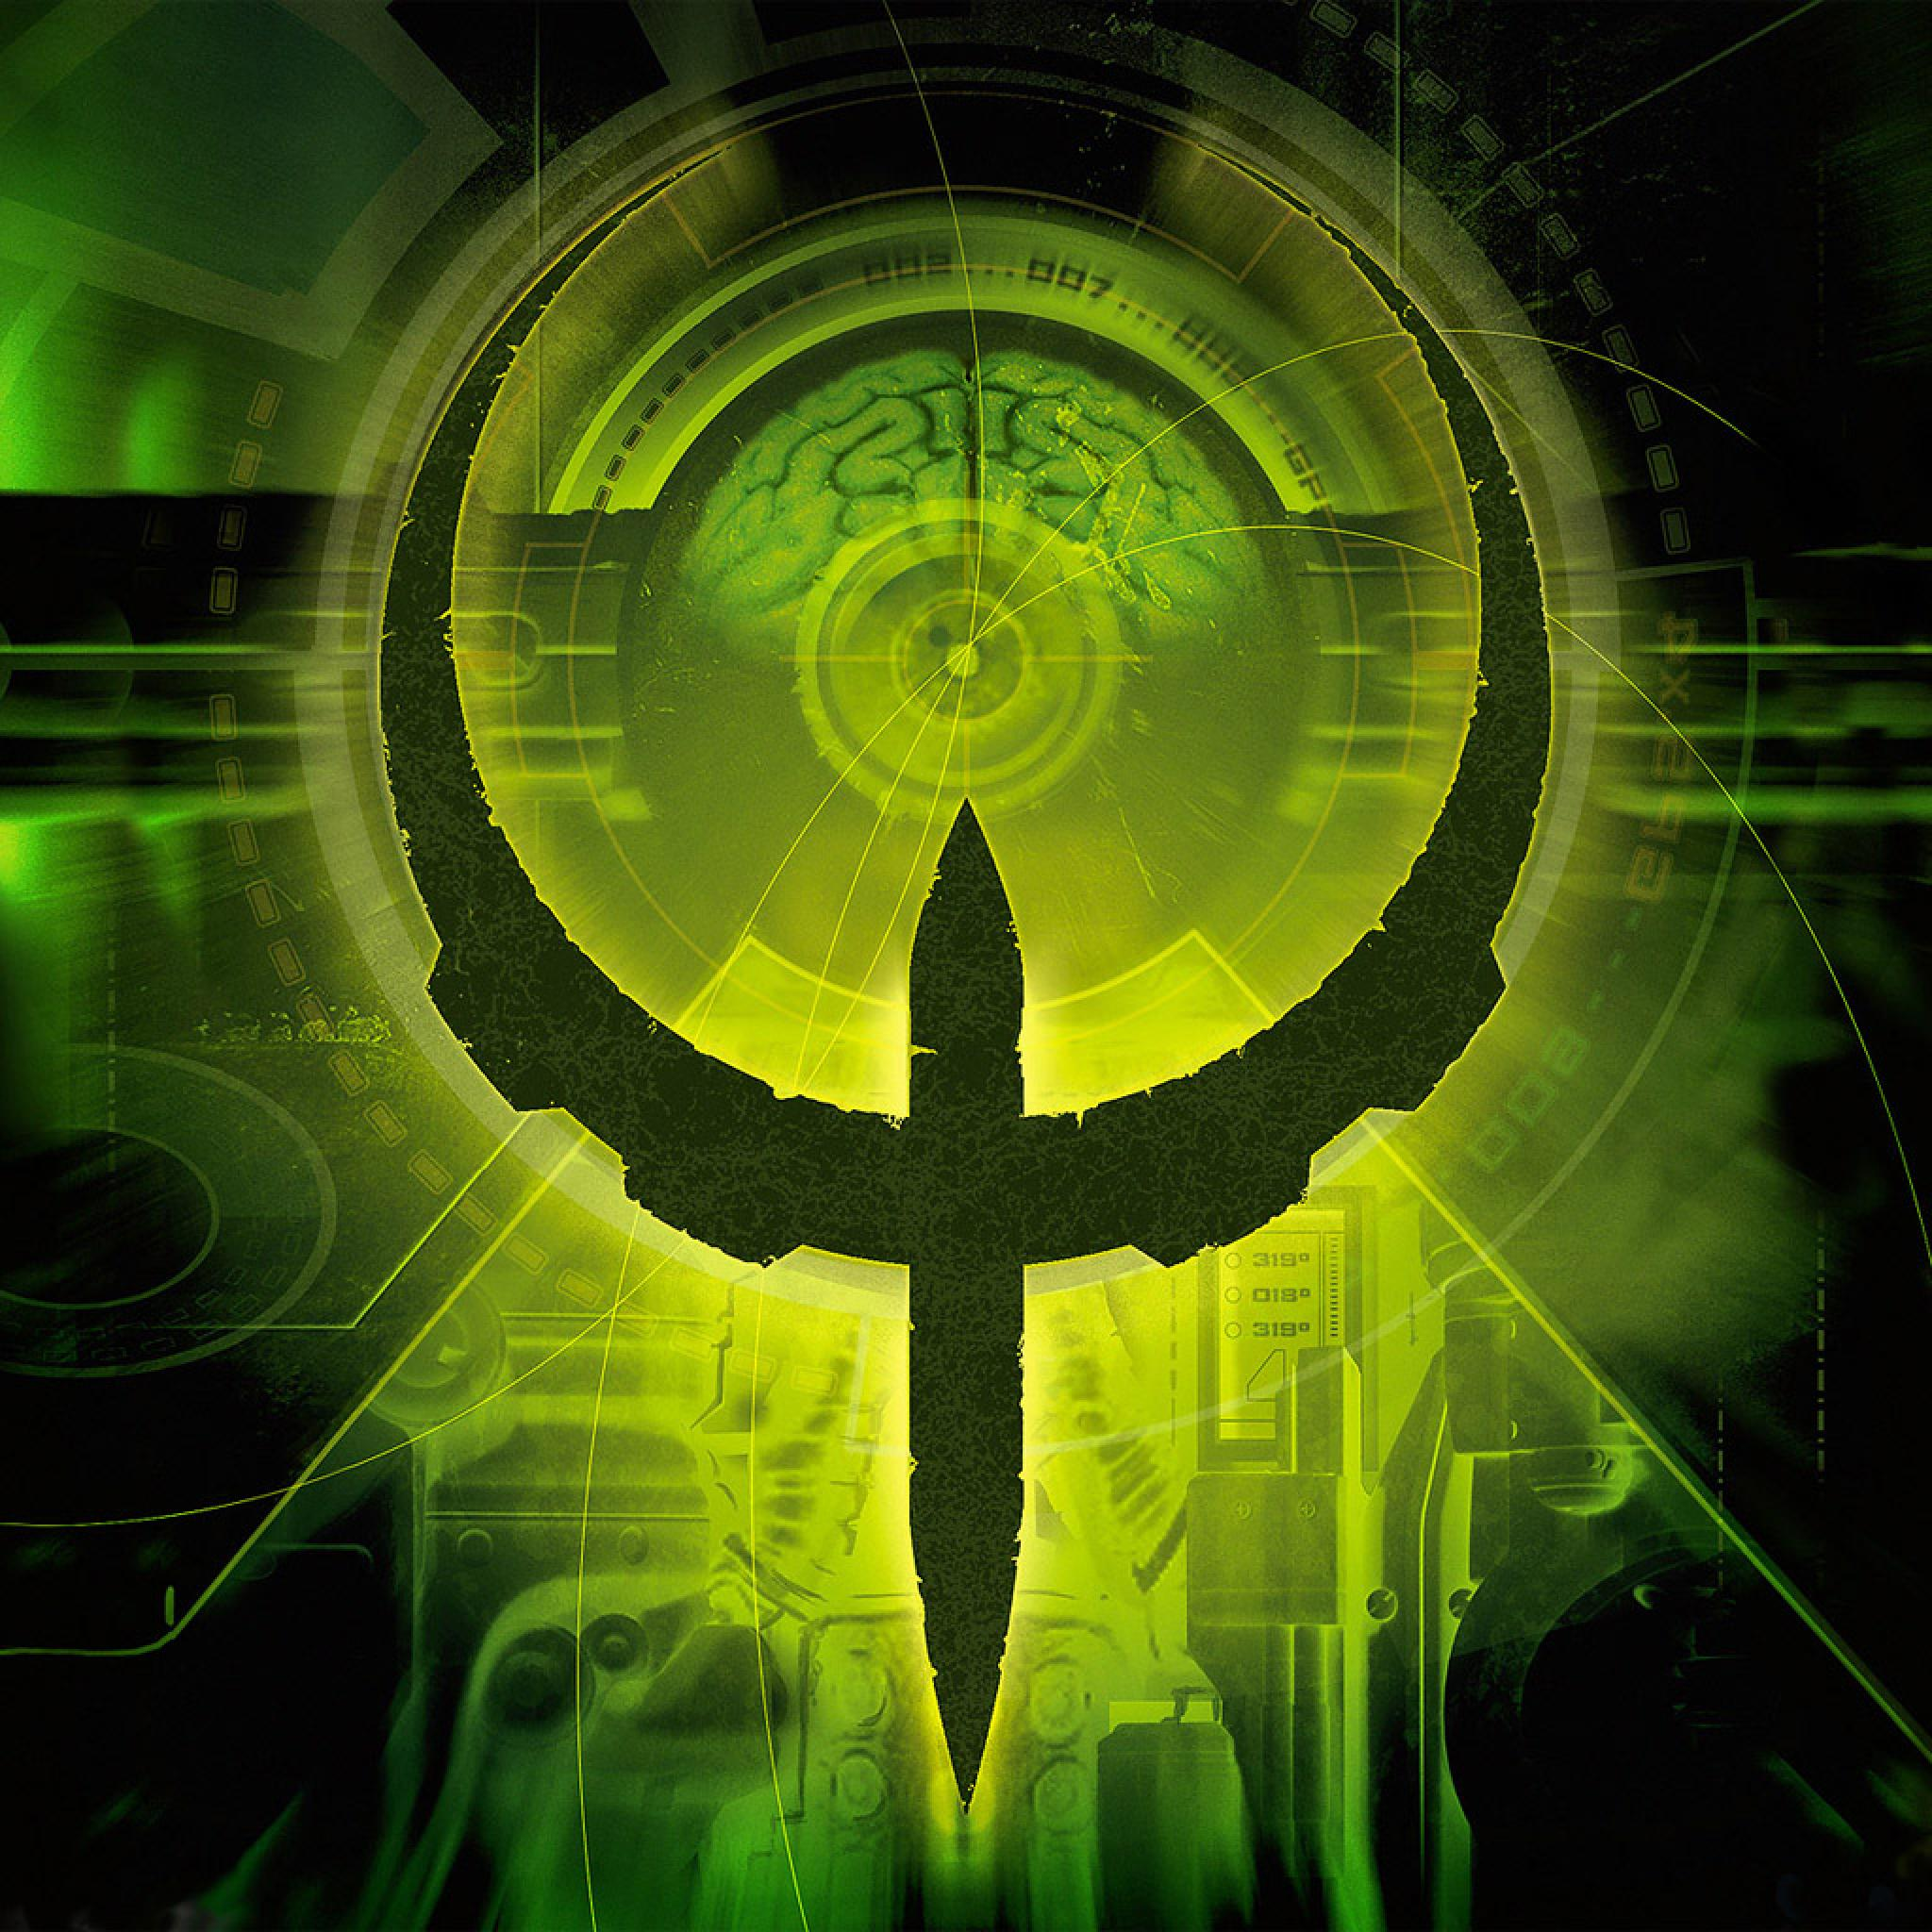 Hd Nfs Cars Wallpapers Games Quake 4 Logo Ipad Iphone Hd Wallpaper Free